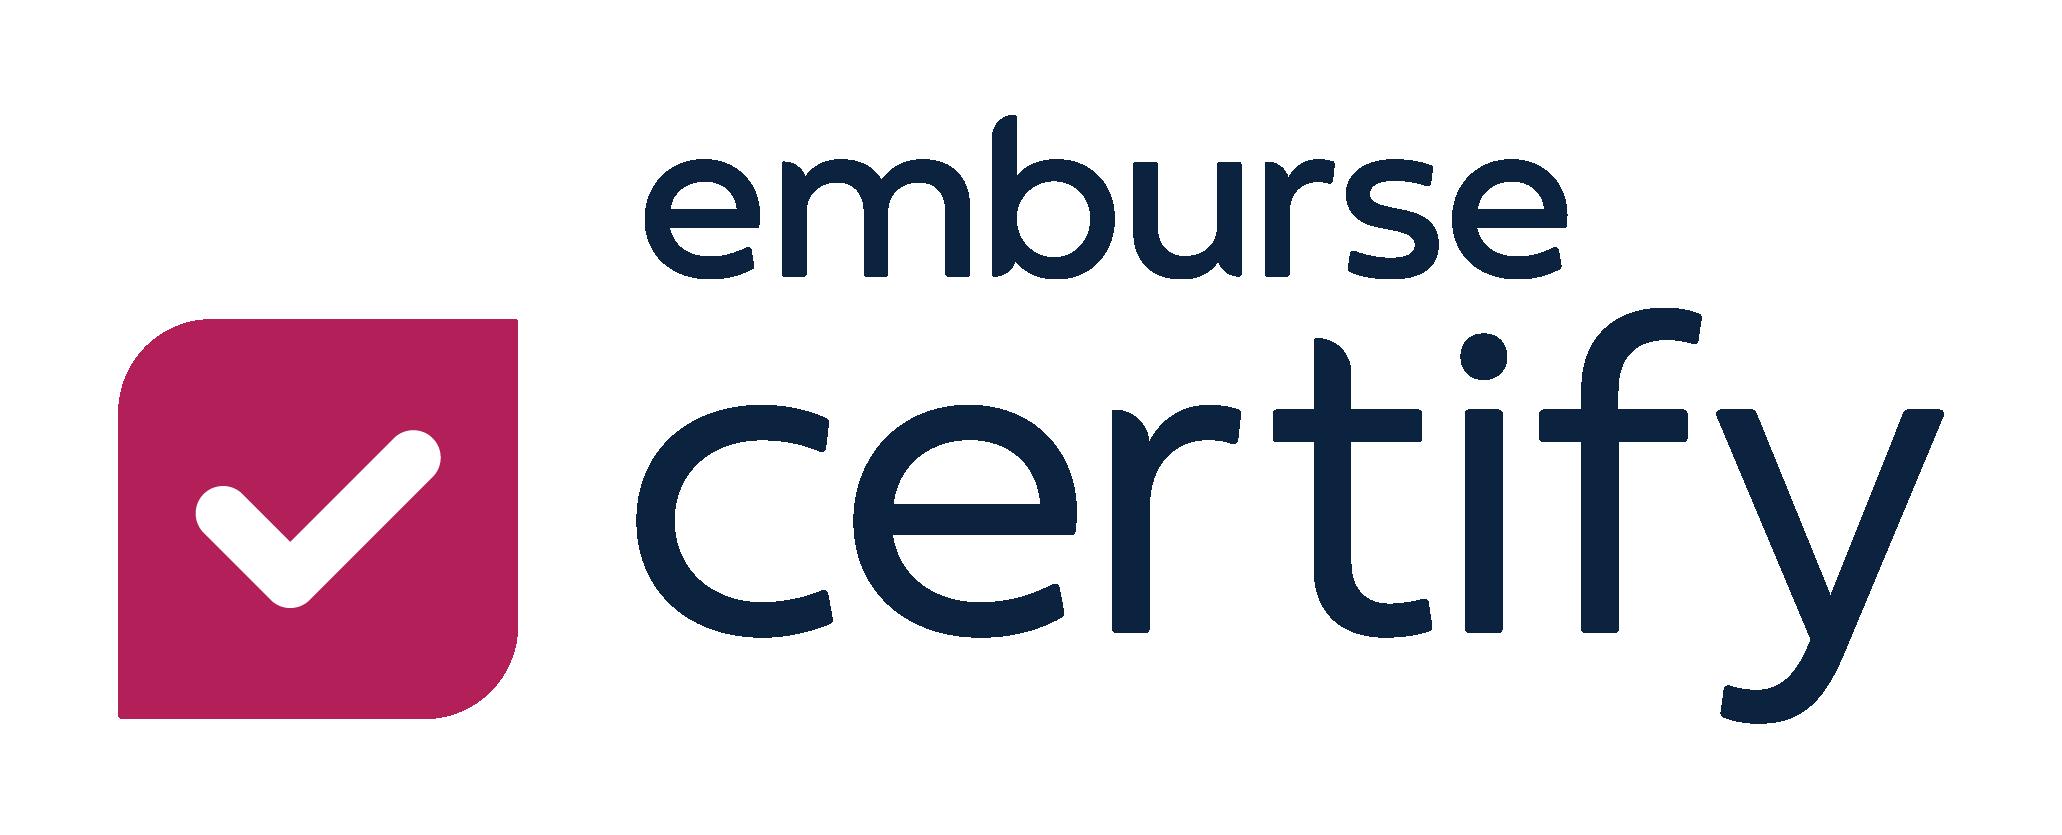 Emburse Certify